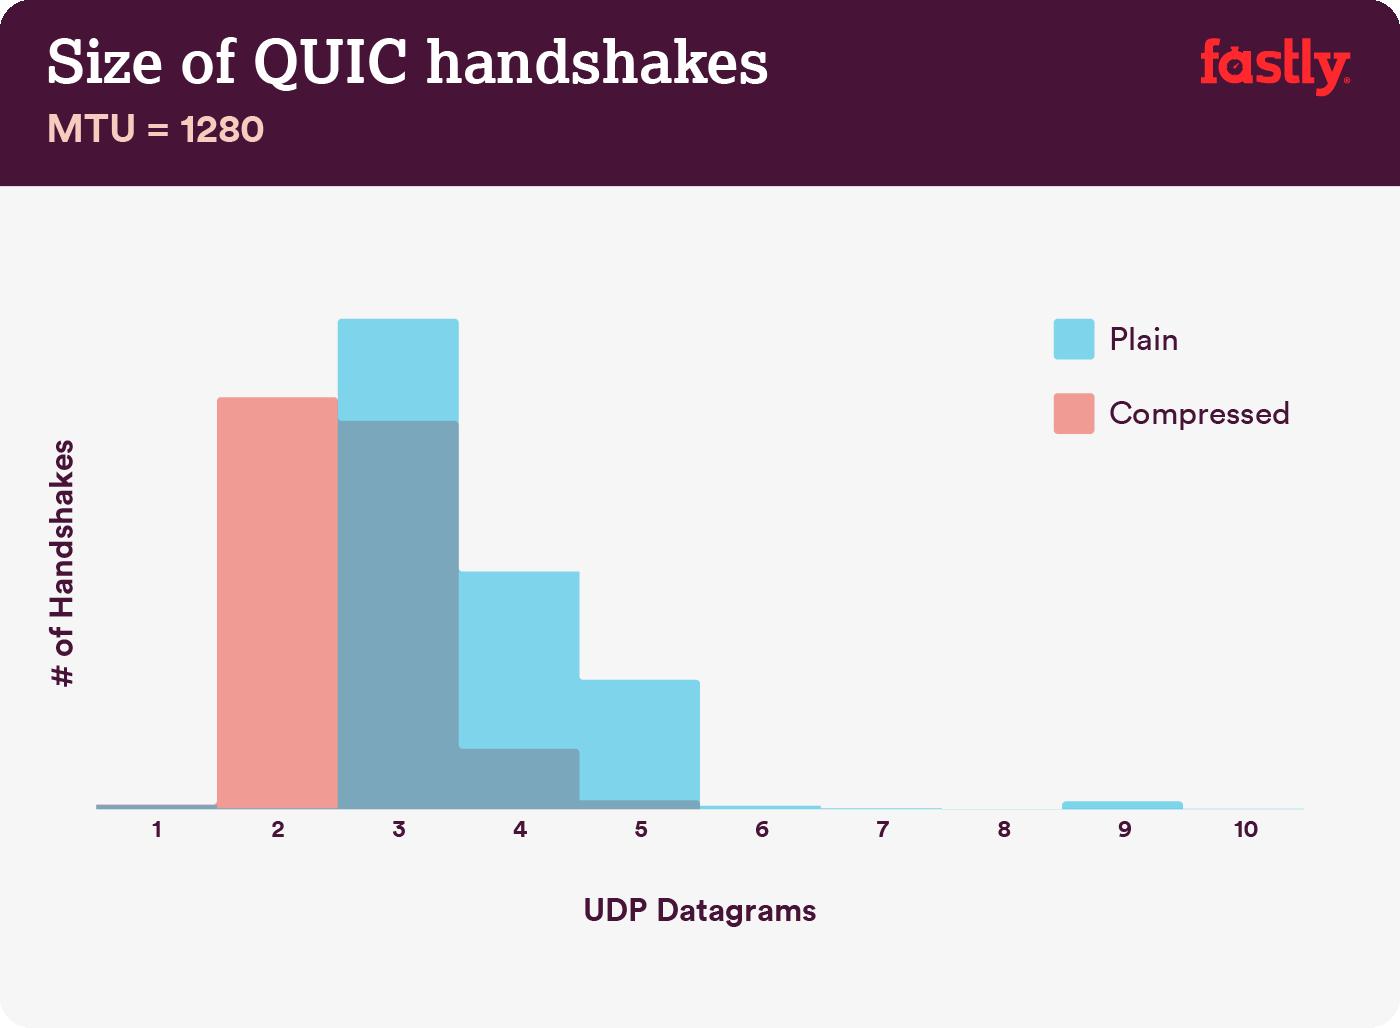 QUIC handshake size 1